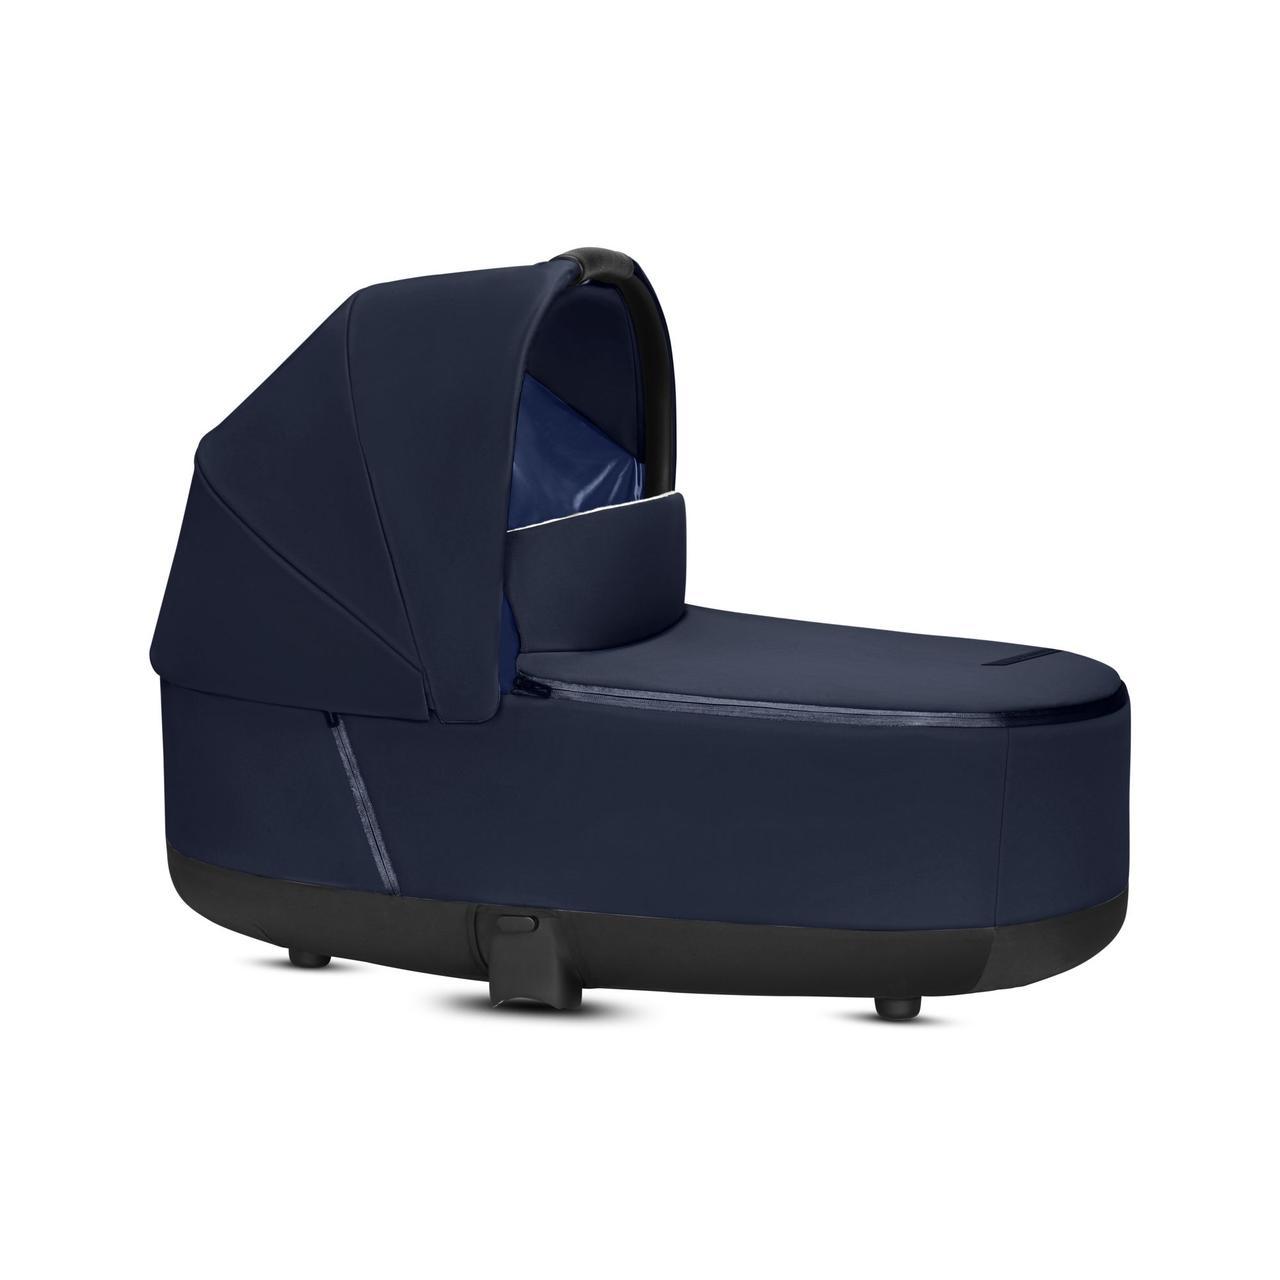 Cybex - Люлька Priam Lux, цвет Indigo Blue